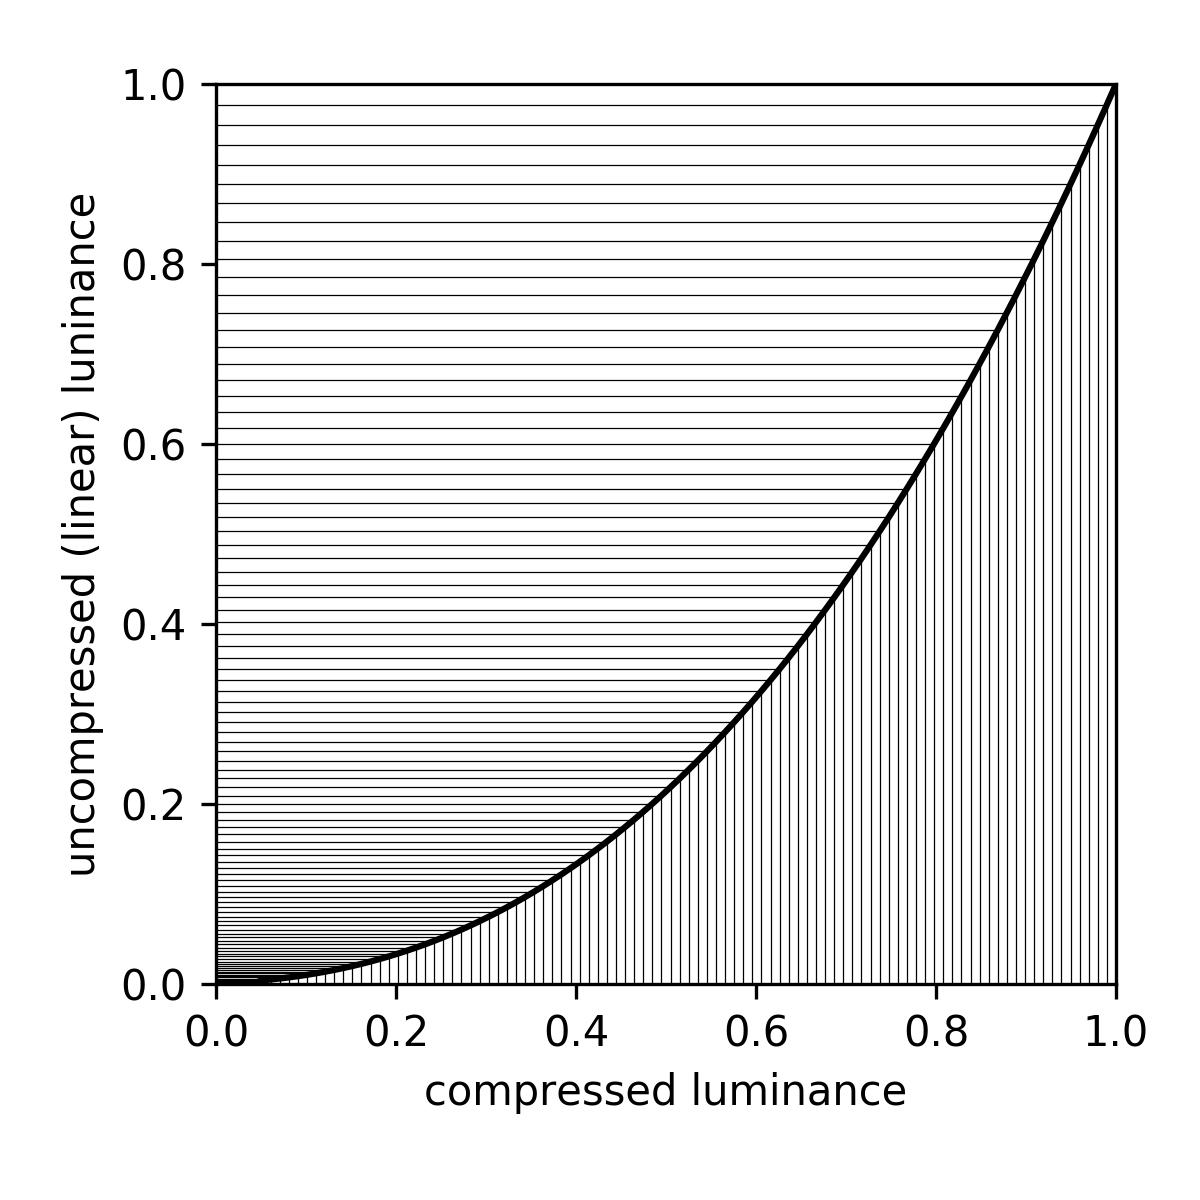 Gamma compression function